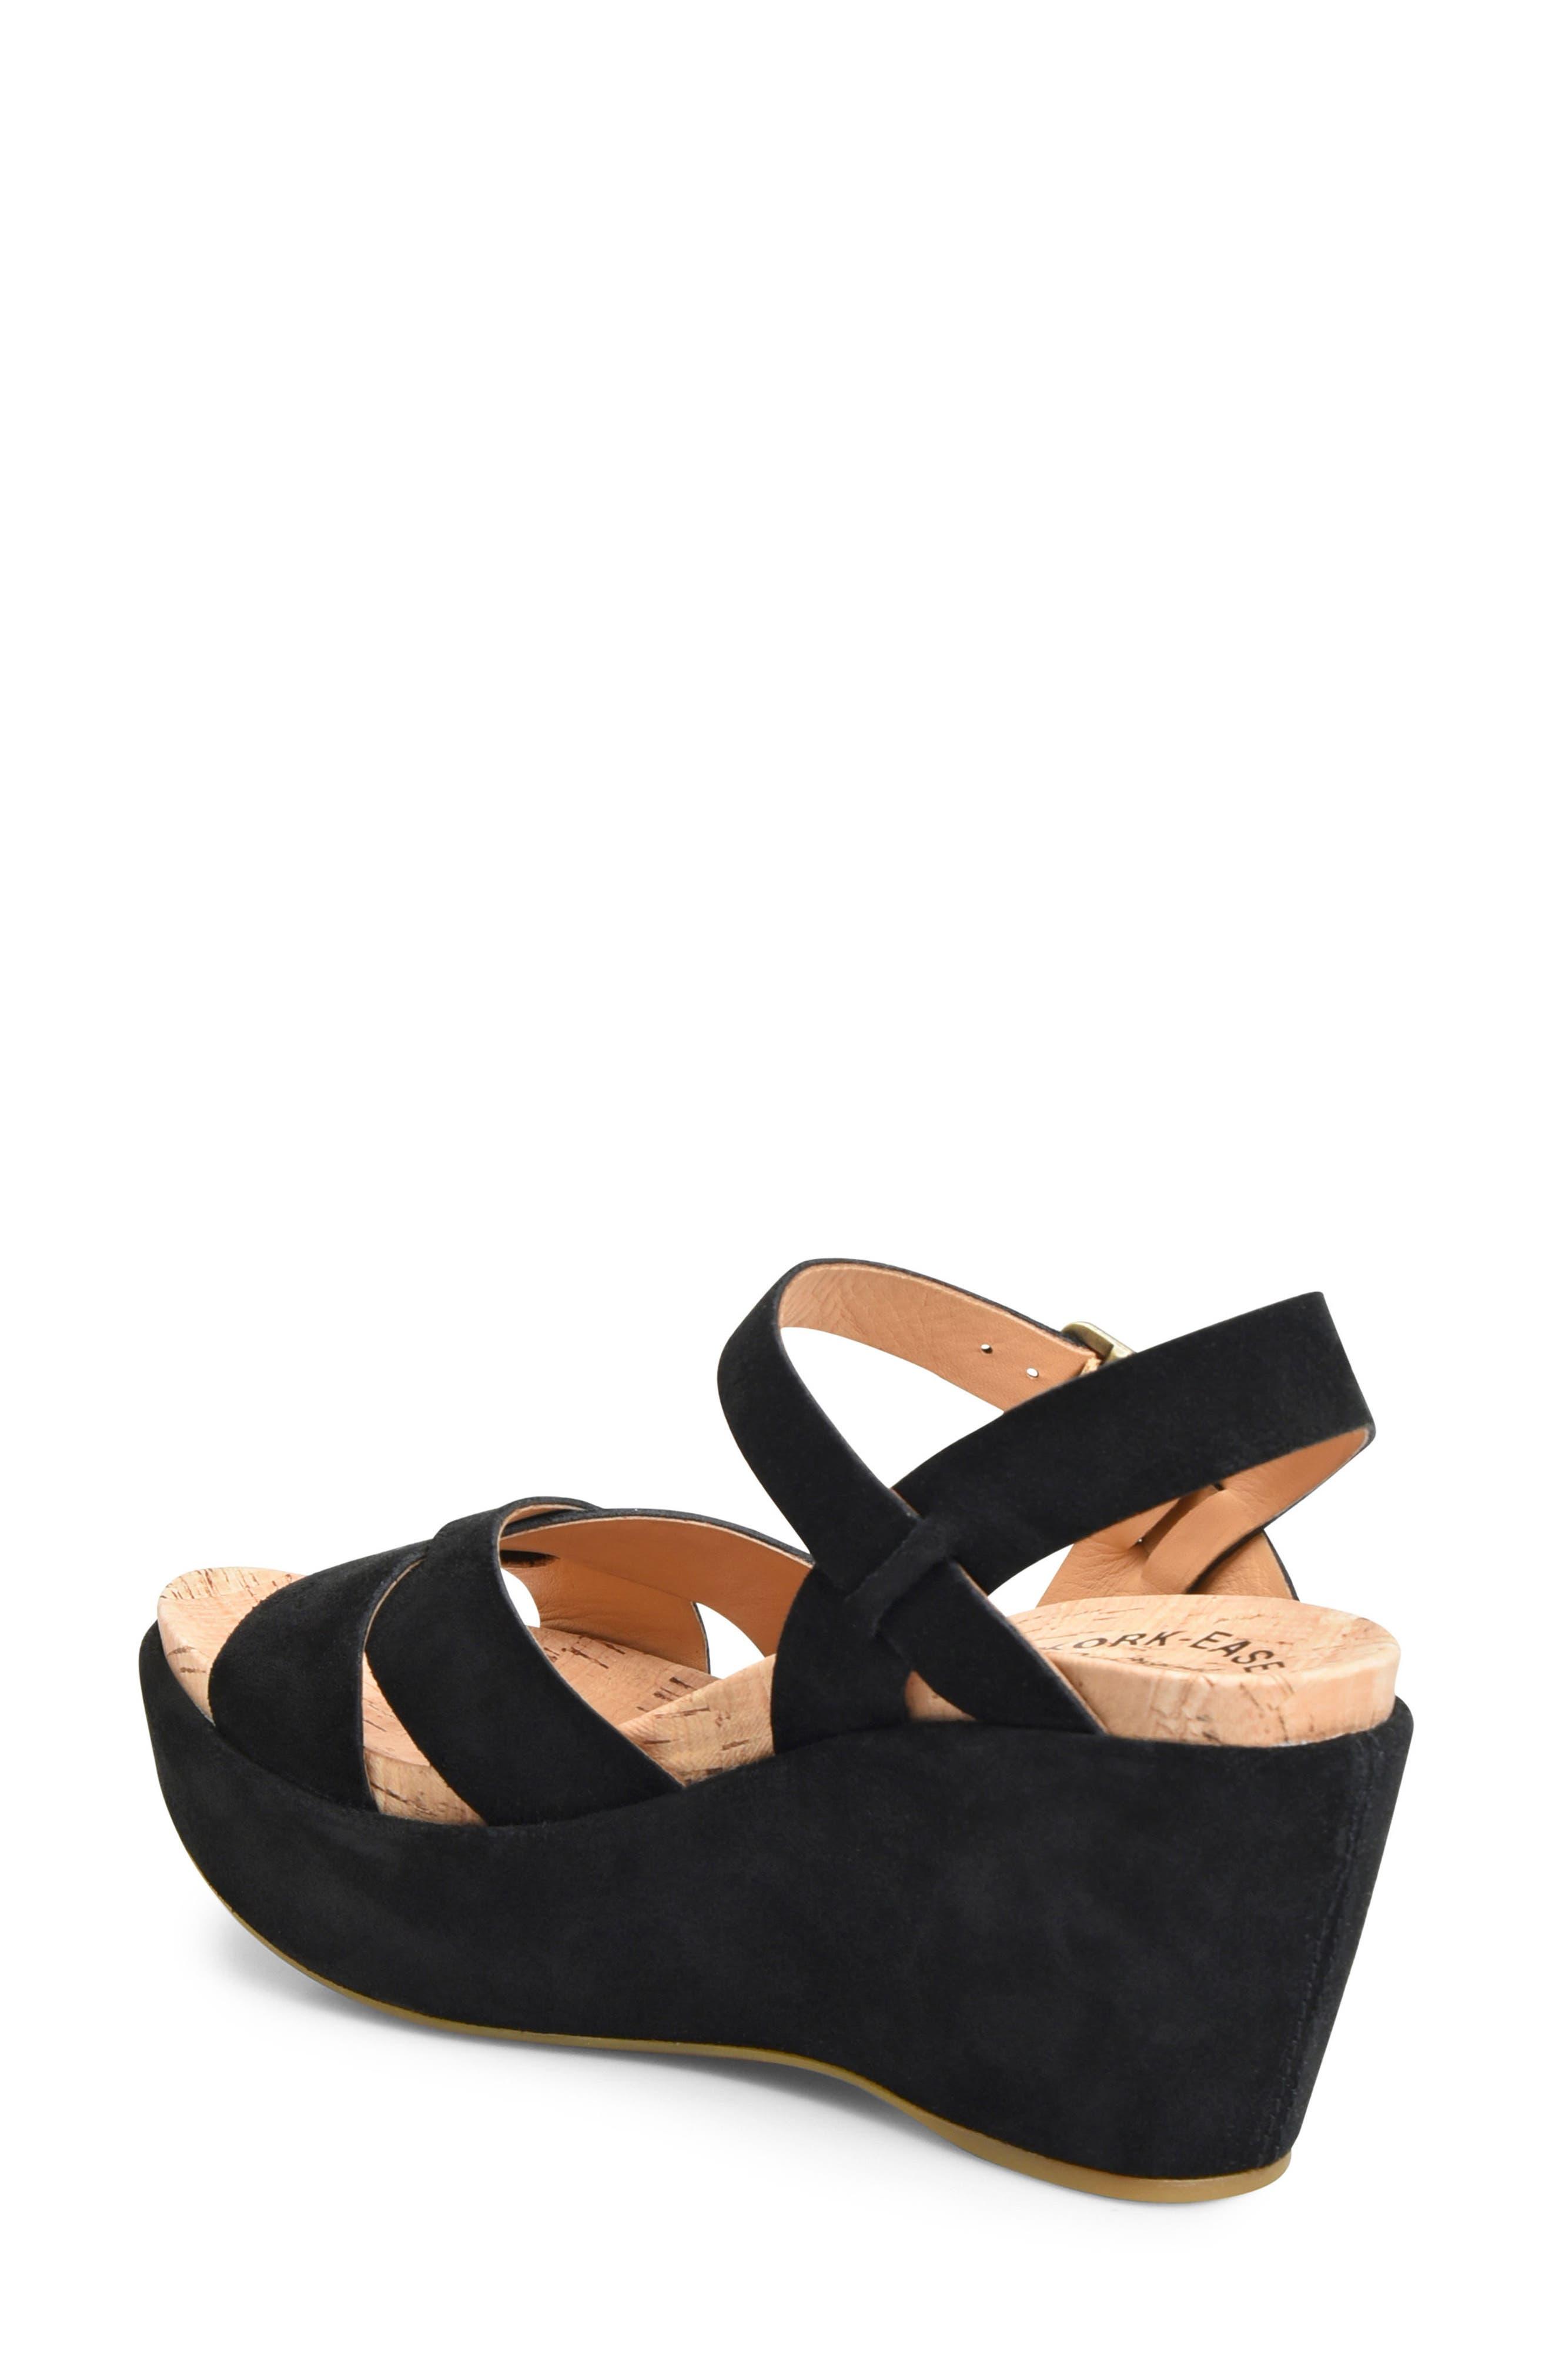 'Ava 2.0' Platform Wedge Sandal,                             Alternate thumbnail 2, color,                             BLACK SUEDE 2